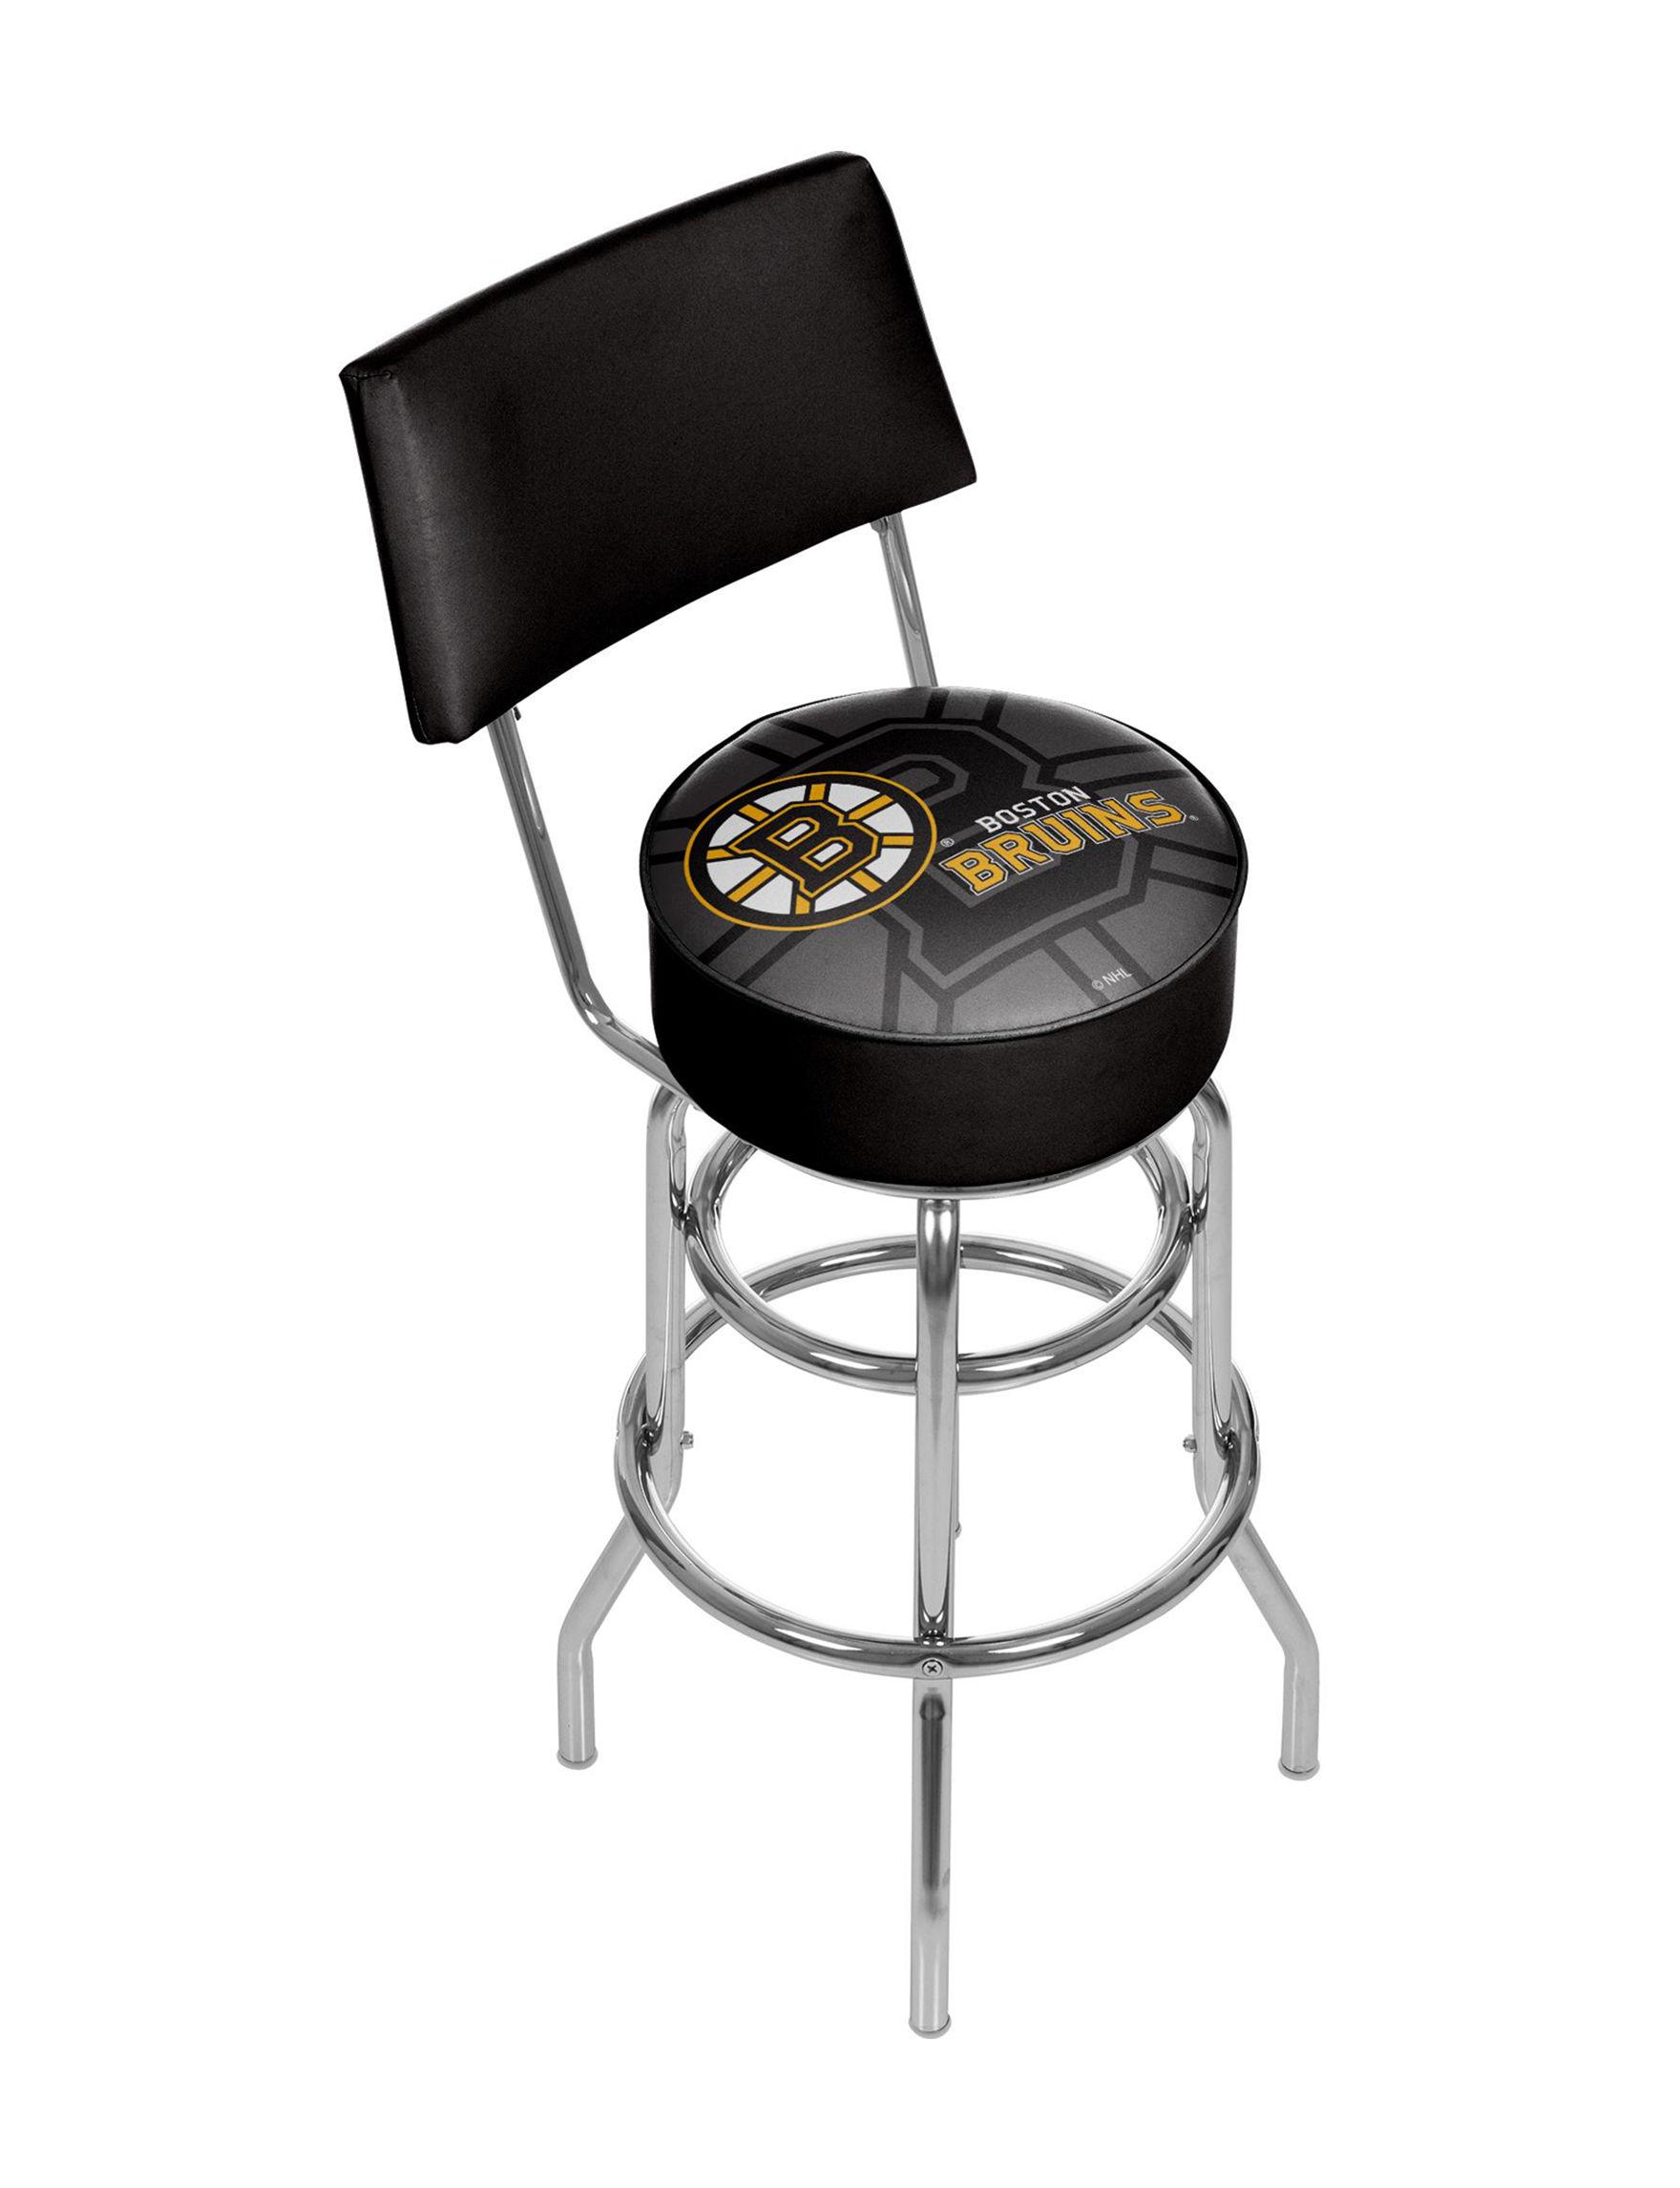 Trademark Global Black / Yellow Bar & Kitchen Stools Game Room Kitchen & Dining Furniture